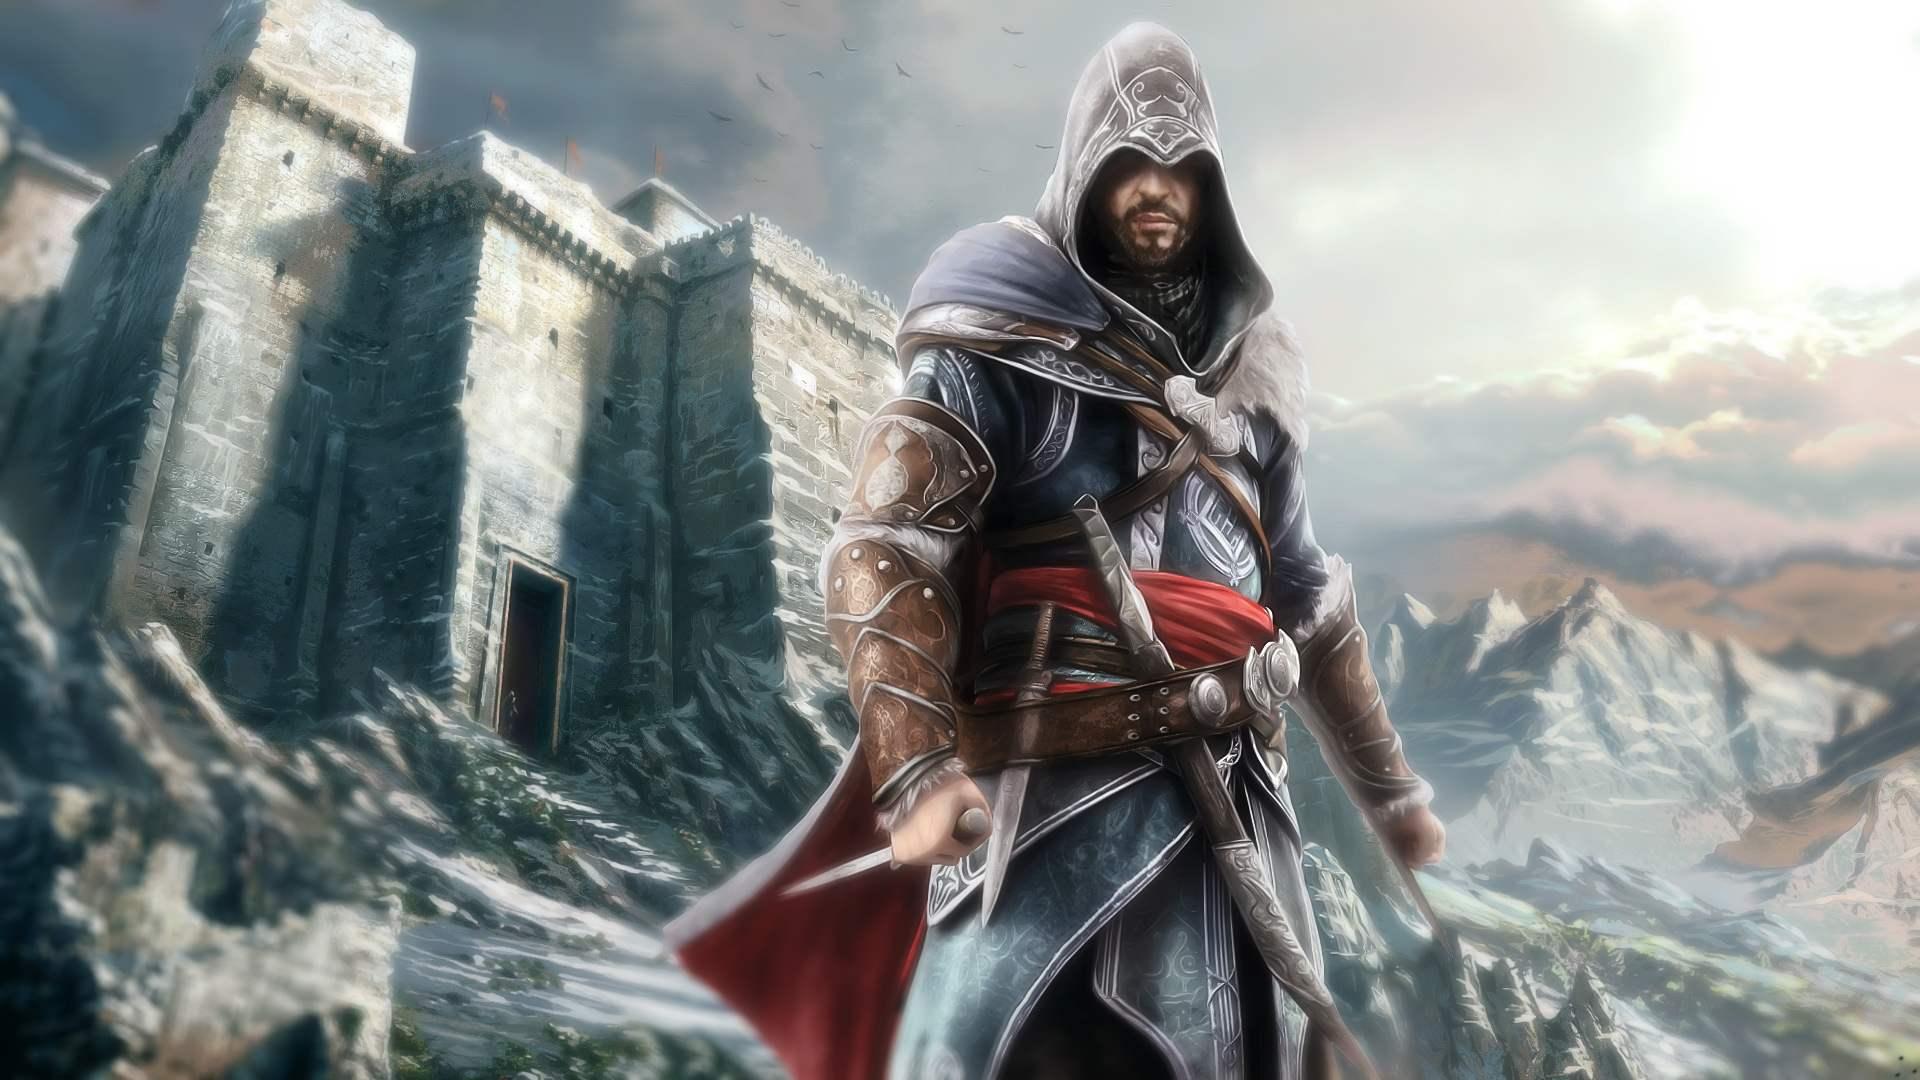 Ezio Assassins Creed Revelations Wallpapers Best Wallpapers Fan 1920x1080